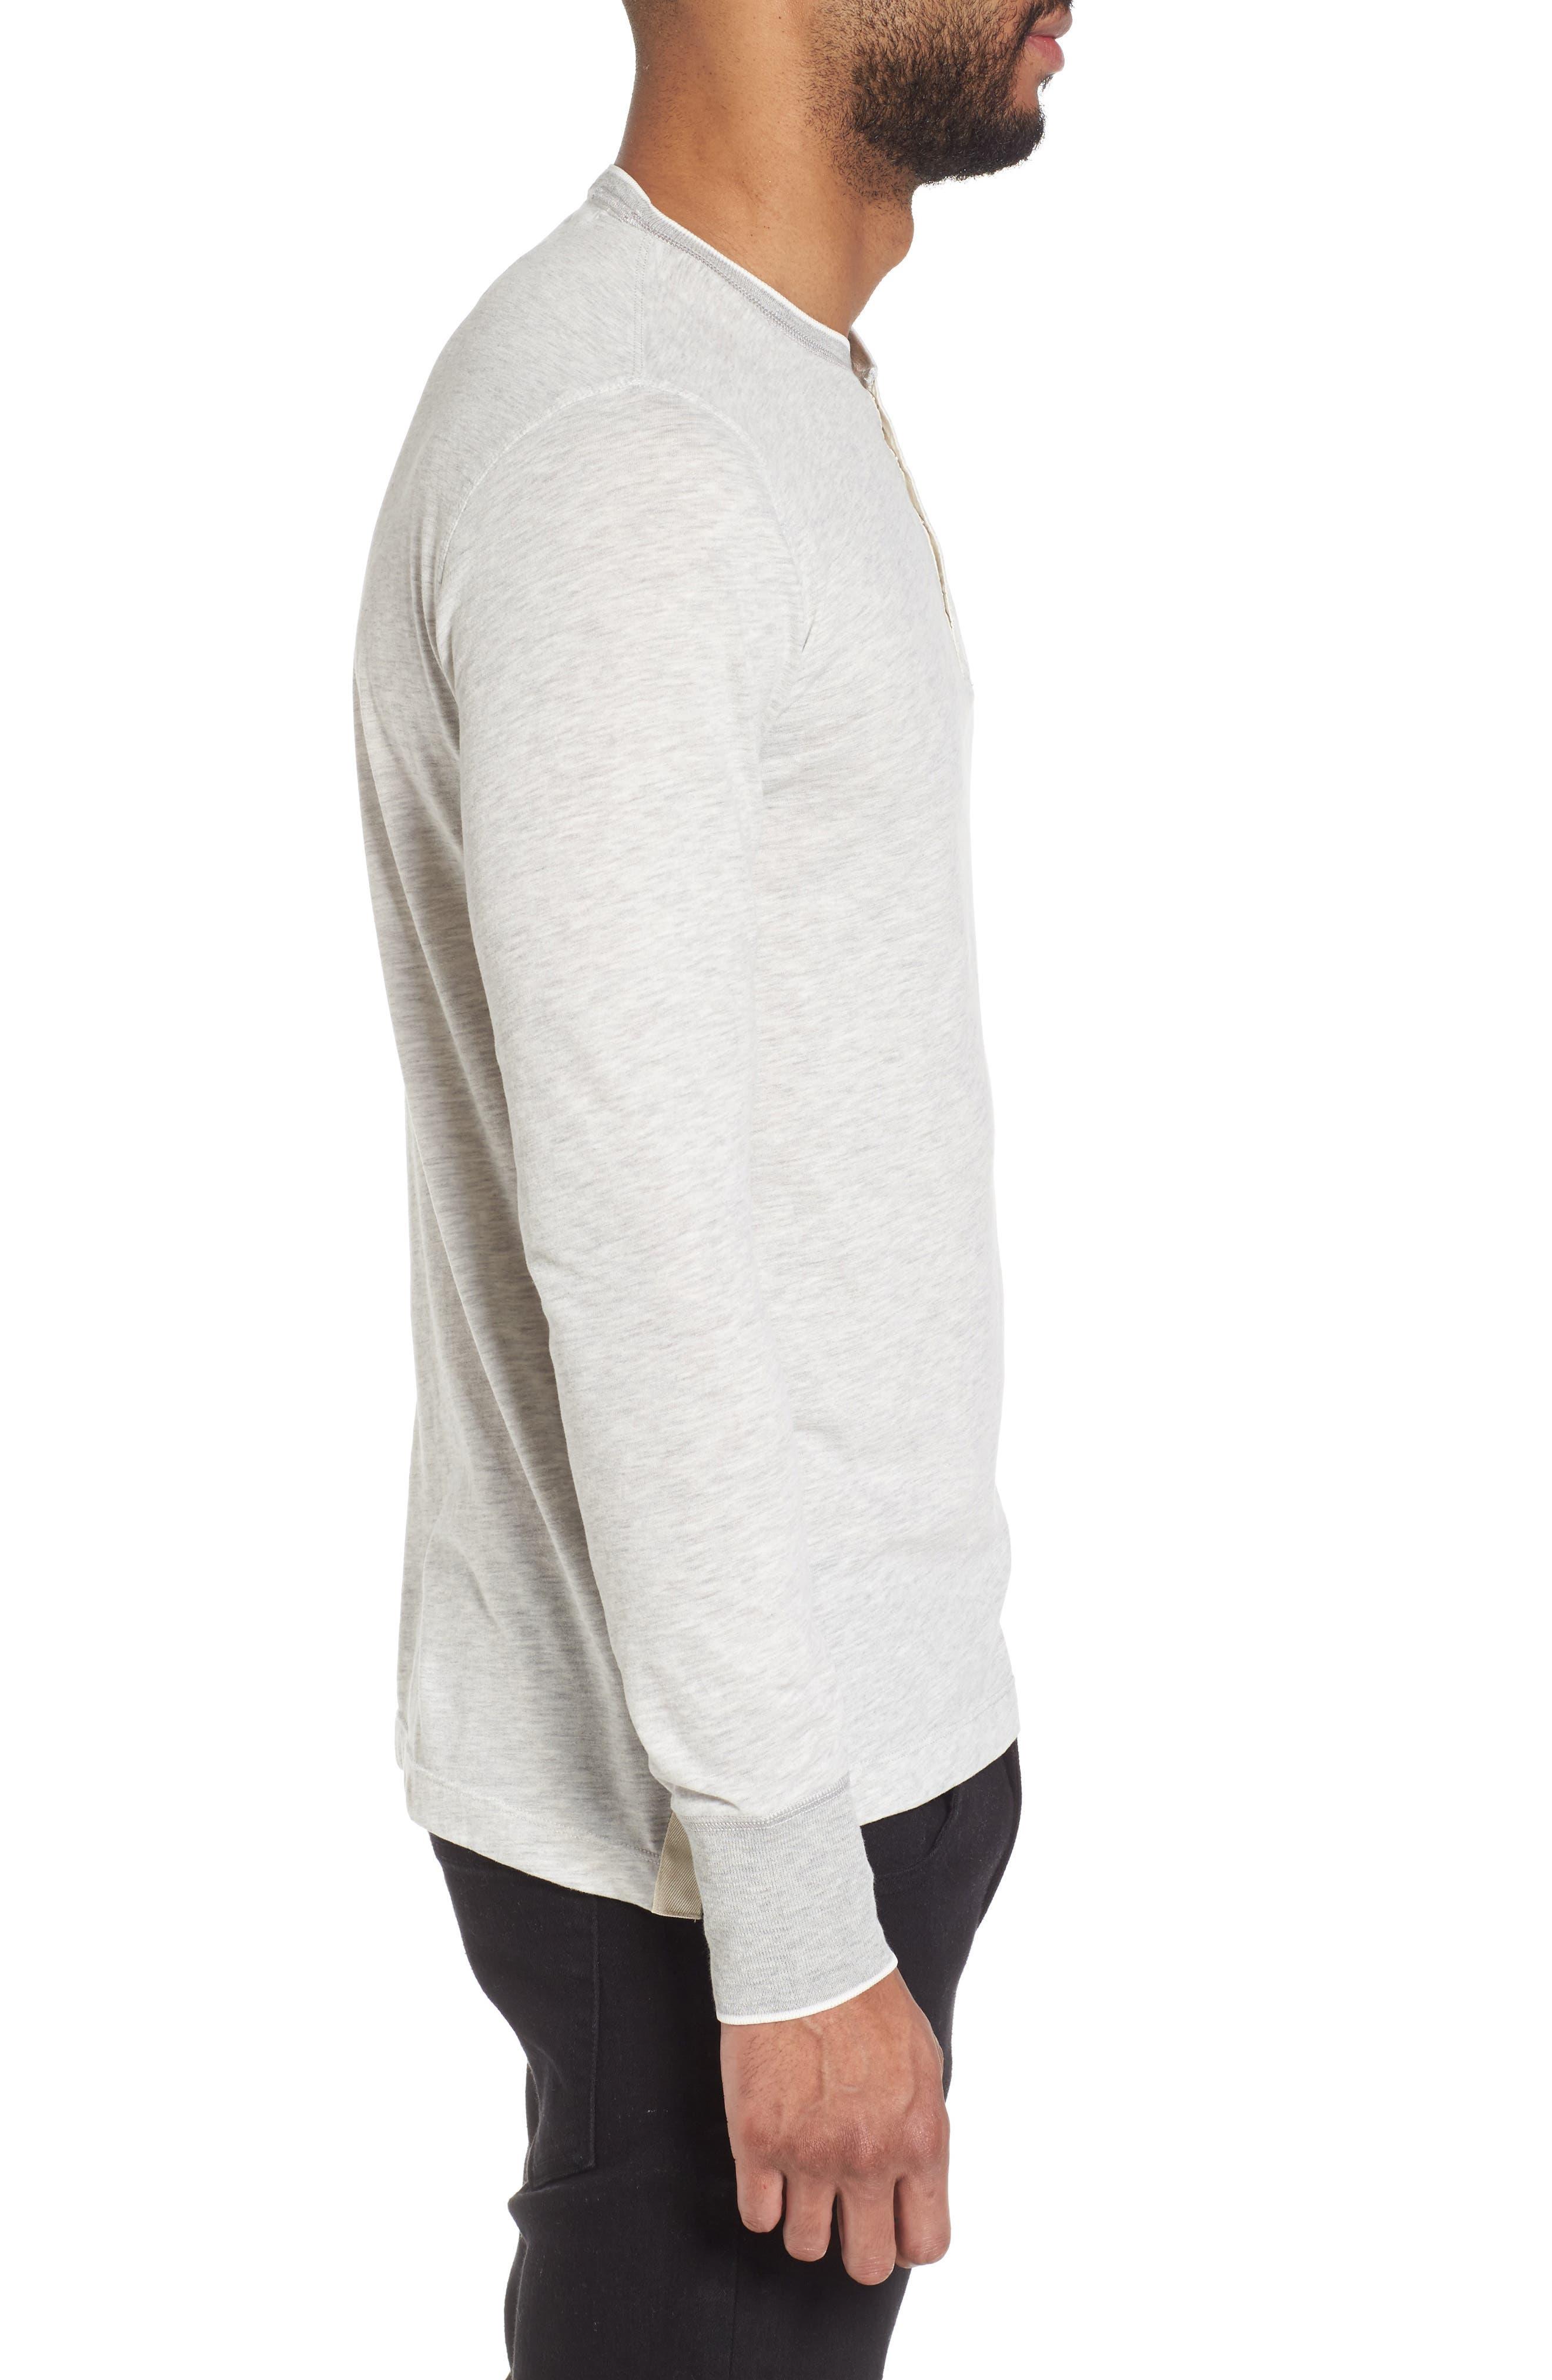 Club Nomade Soft Granddad T-Shirt,                             Alternate thumbnail 3, color,                             020